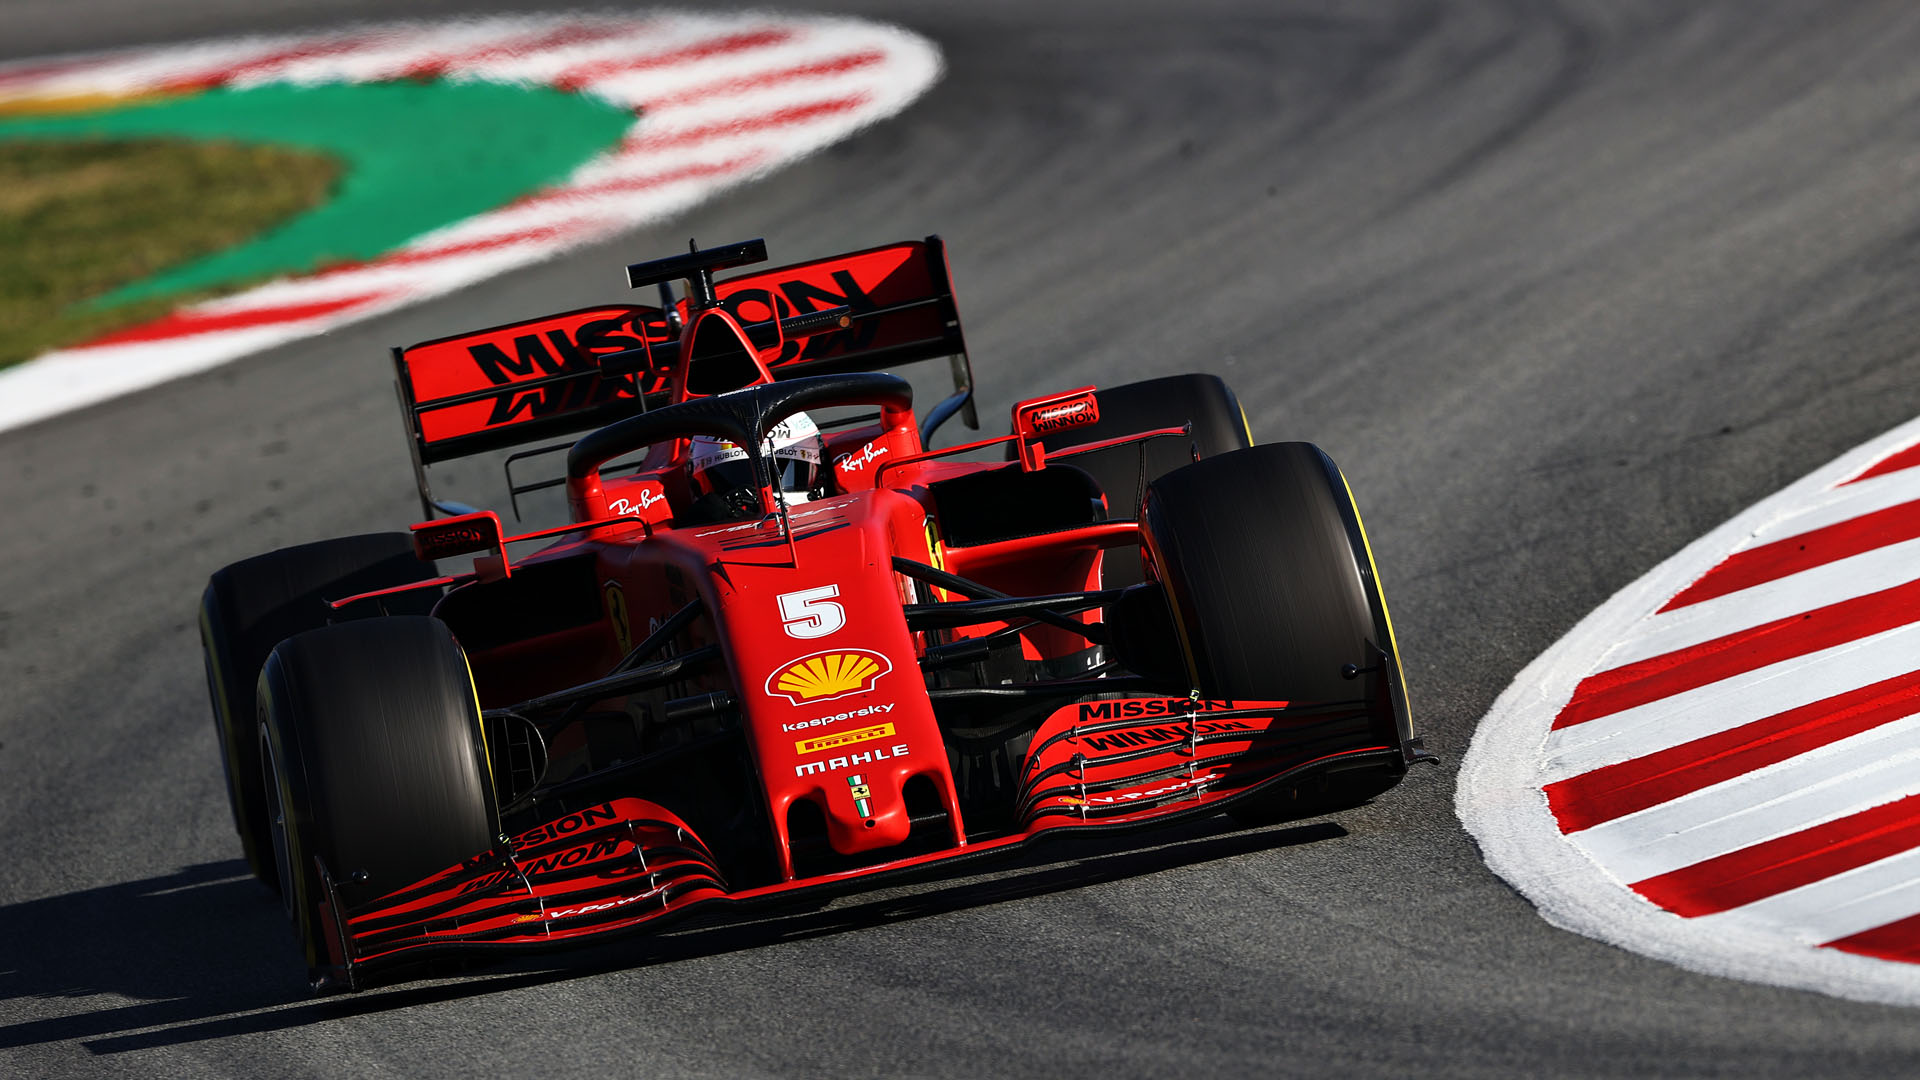 Sebastian Vettel Ferrari Sf1000 Definitely A Step Up From Last Year Formula 1